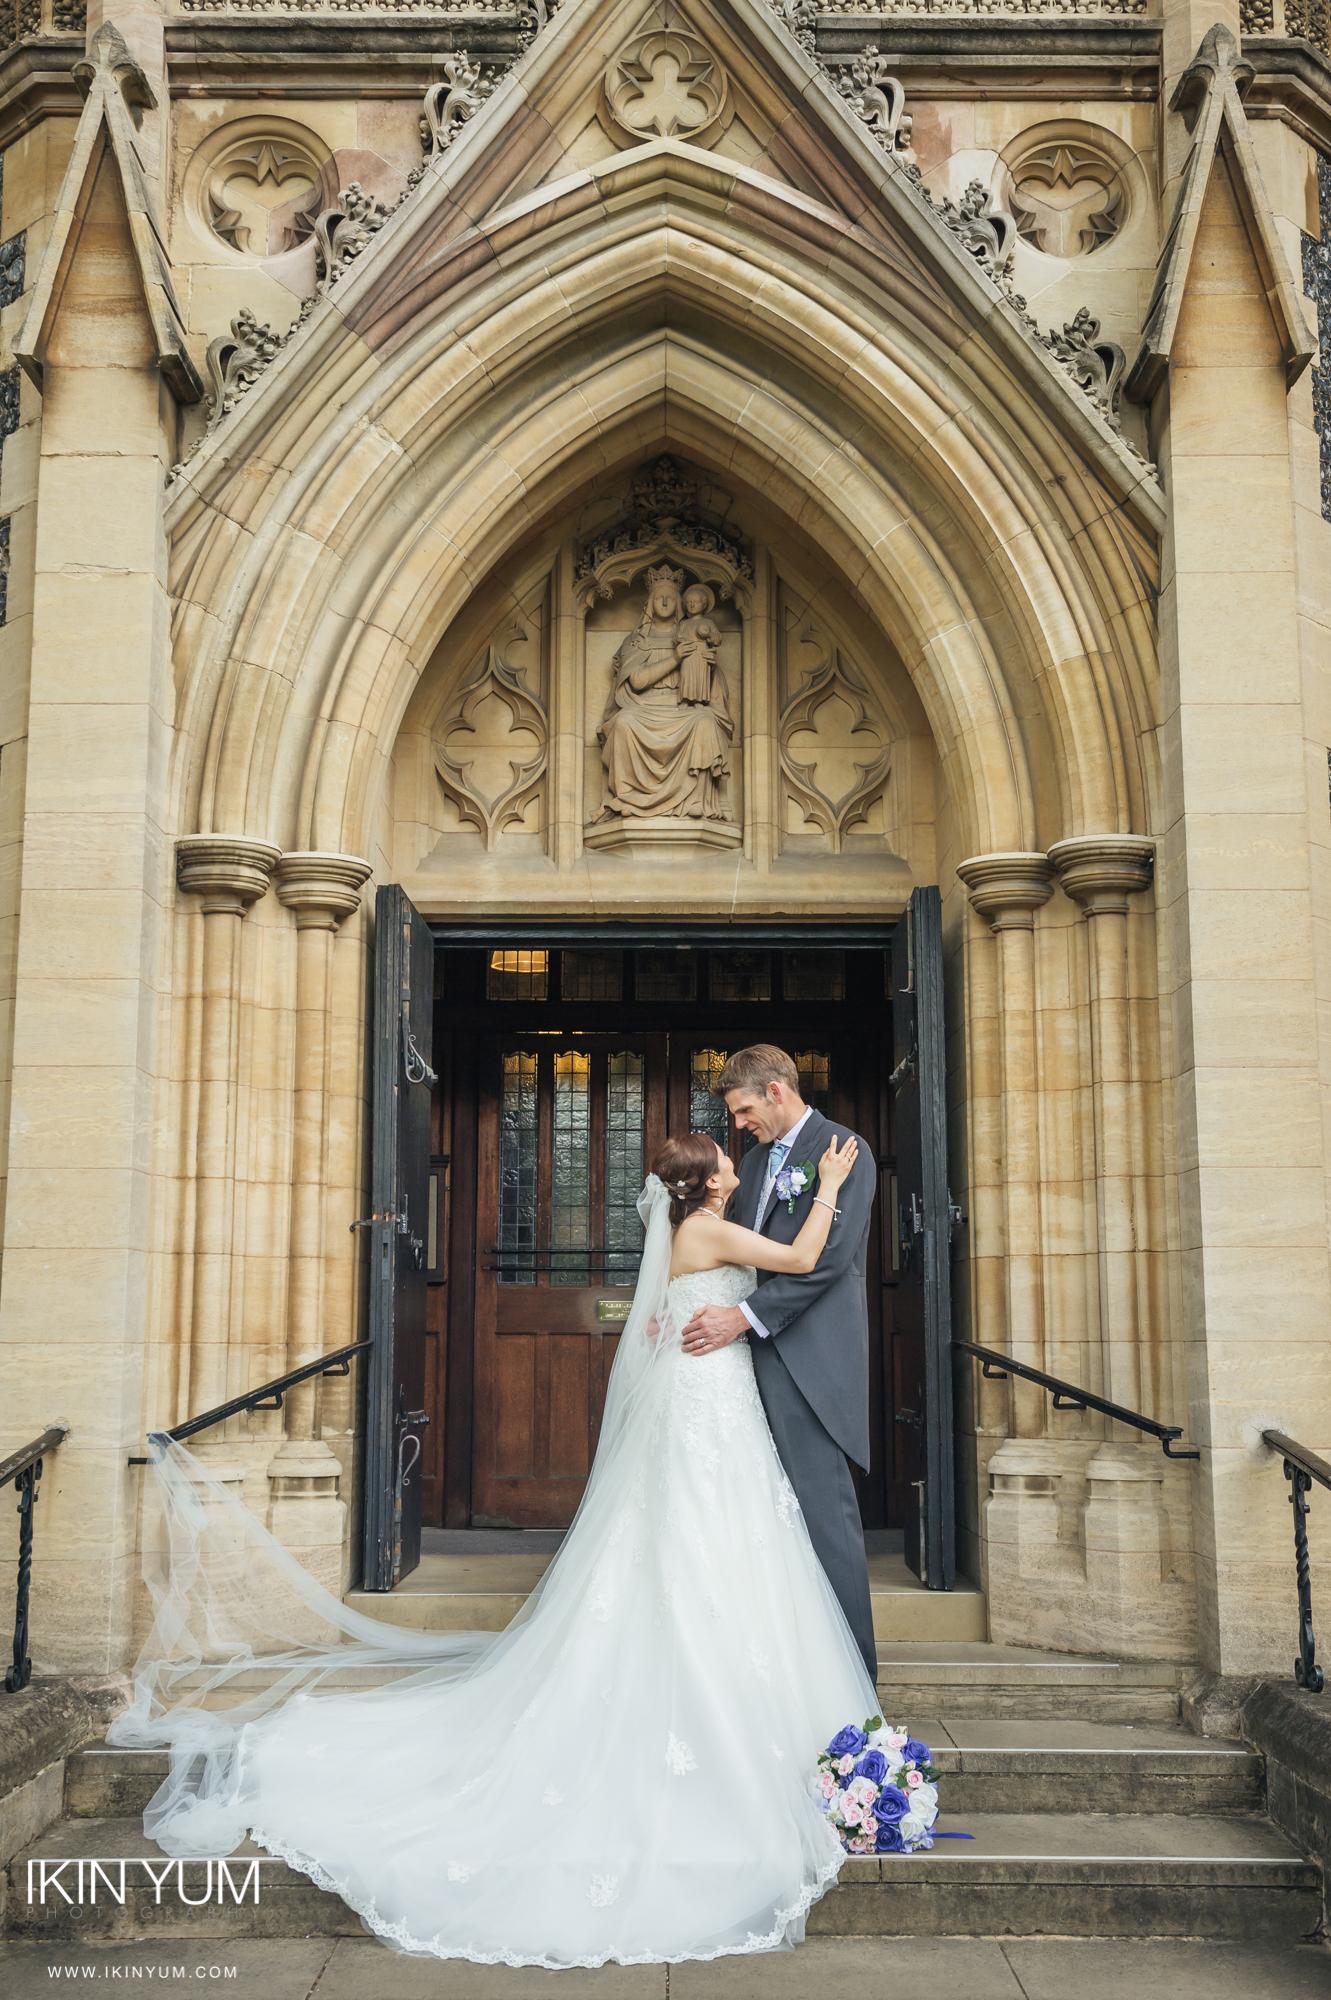 Teresa & Johnathan Weddong Day - Couple Photoshoot-0001.jpg